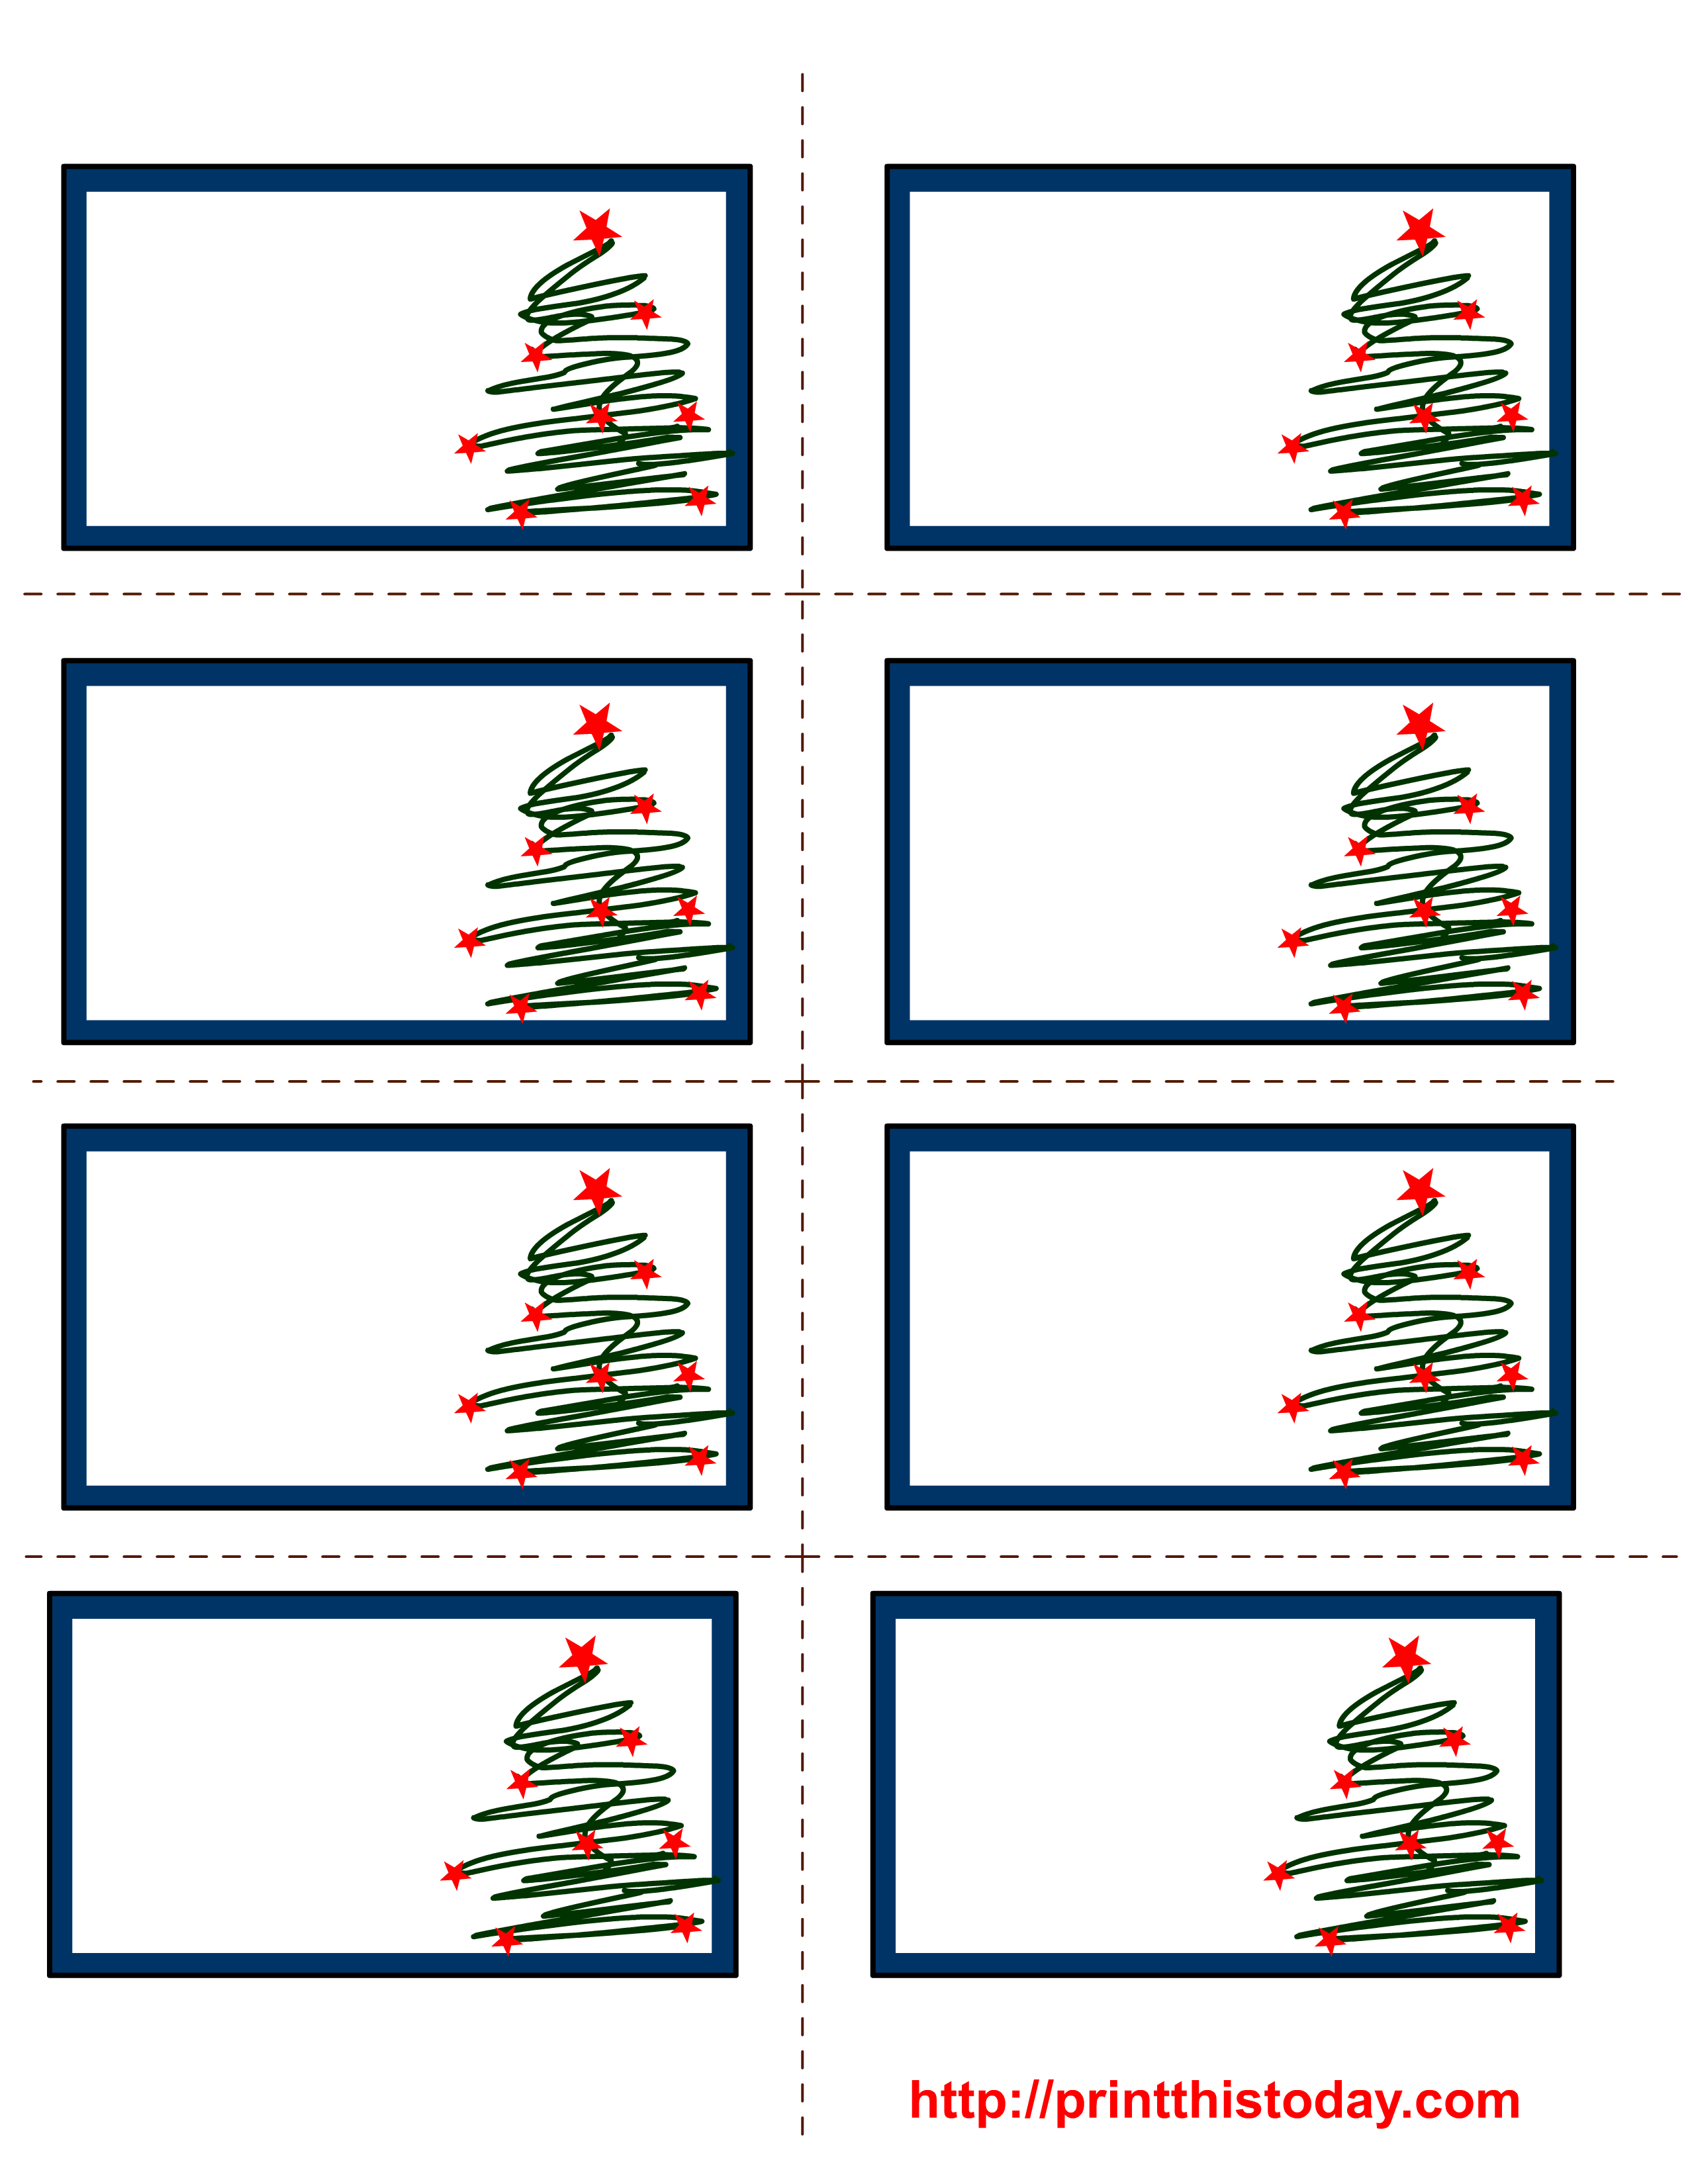 Free Labels Printable | Free Printable Christmas Labels With Trees - Christmas Labels Free Printable Templates